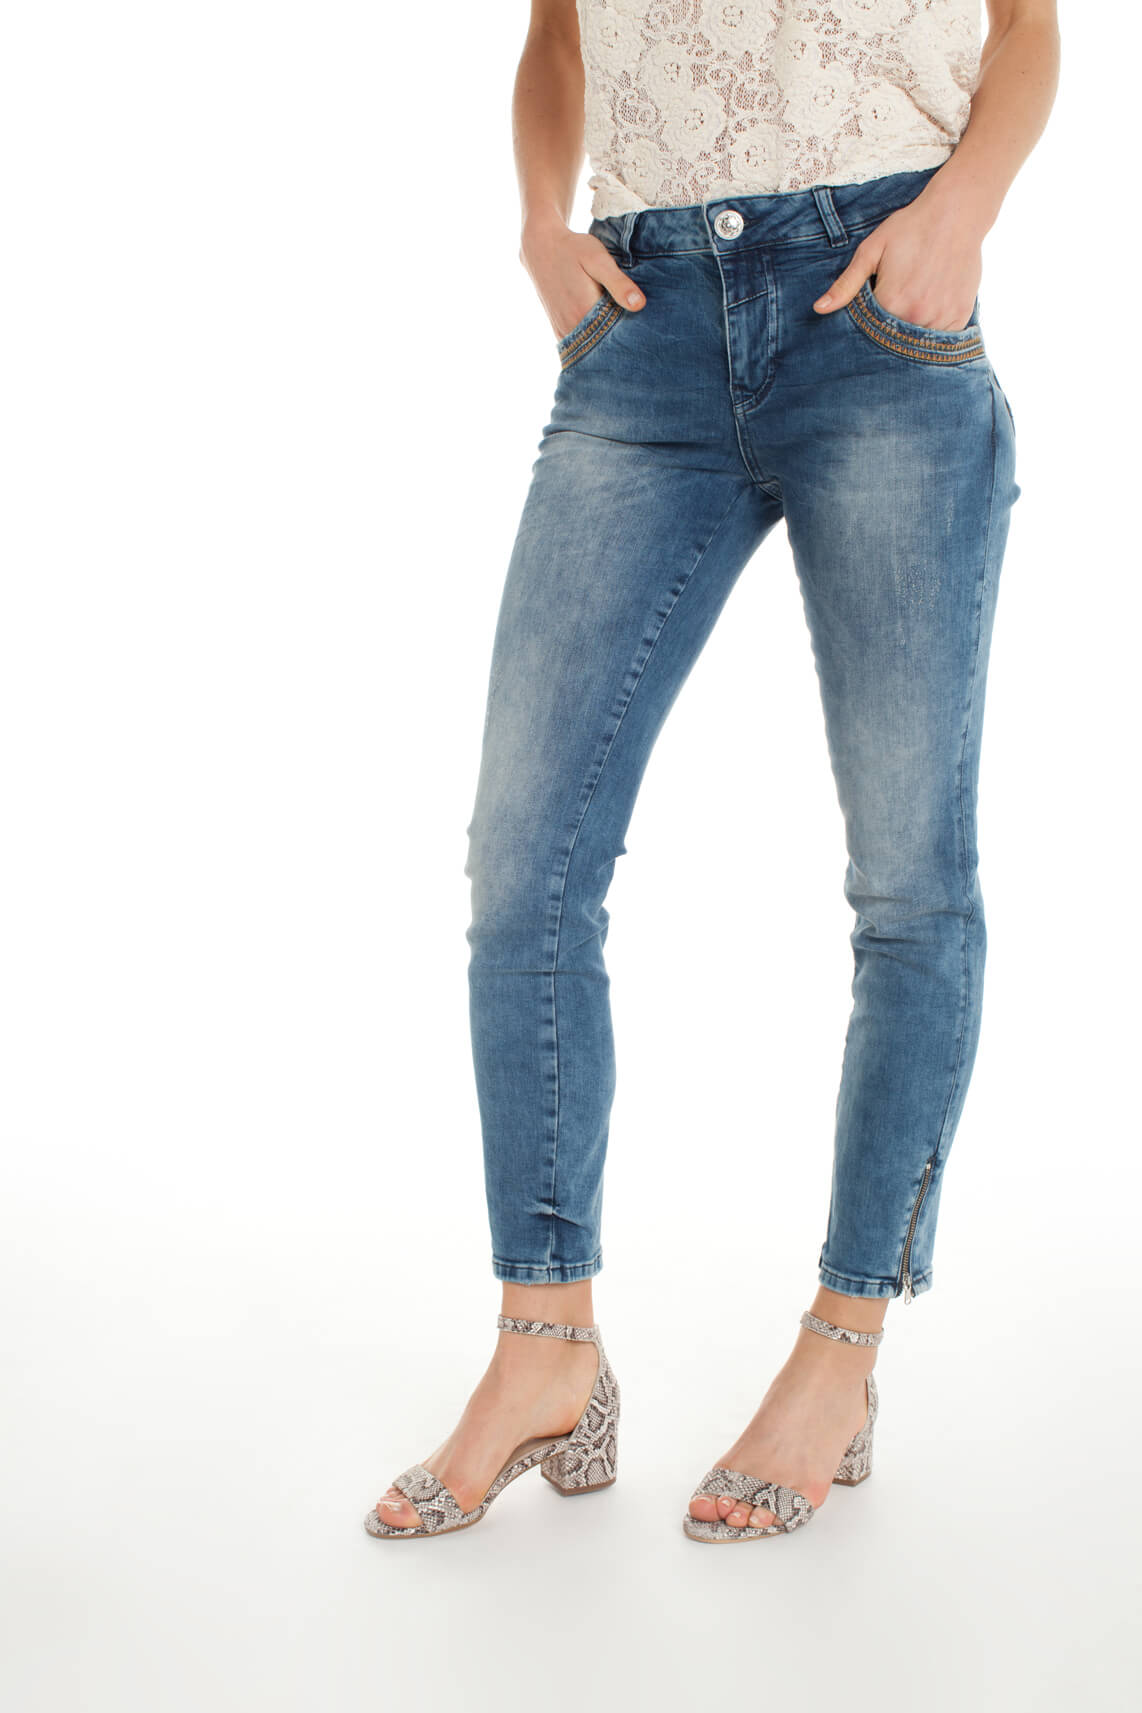 Mos Mosh Dames Naomi 7/8 jeans Blauw